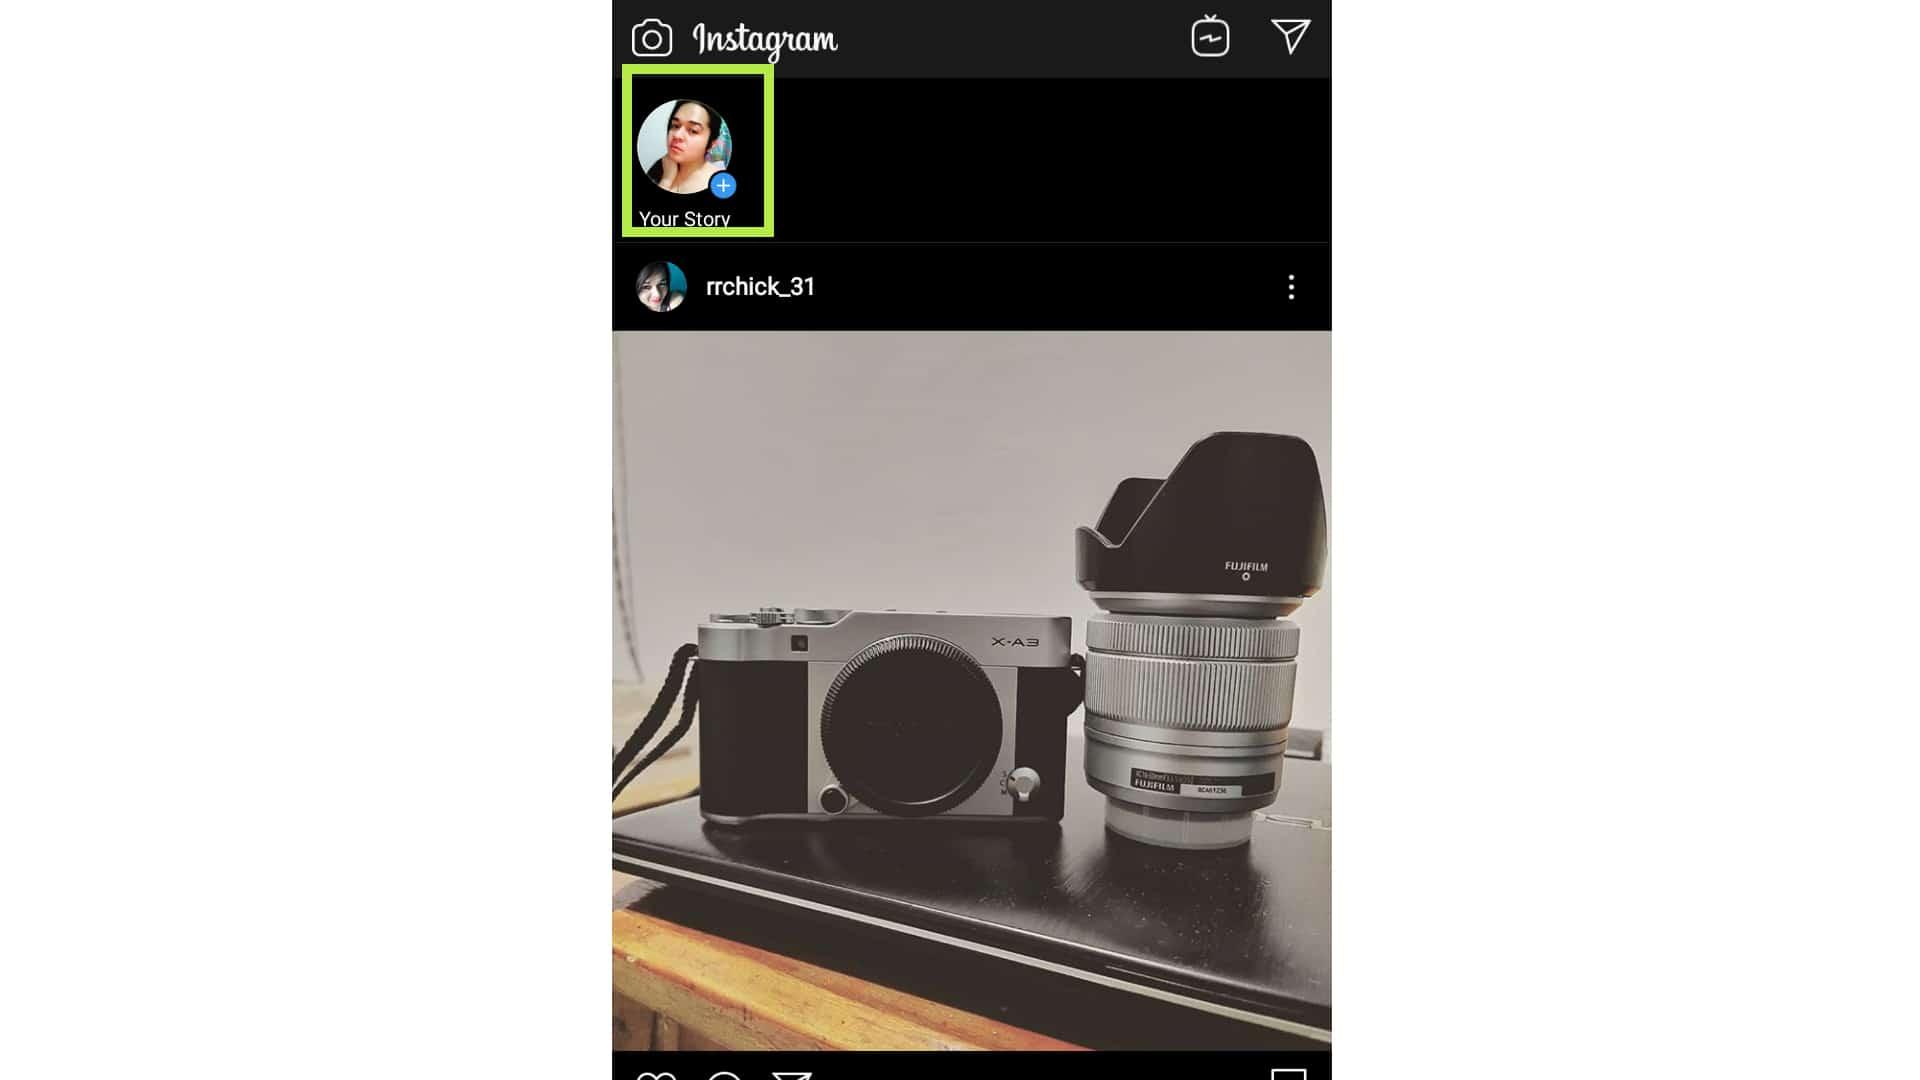 instagram story change background color